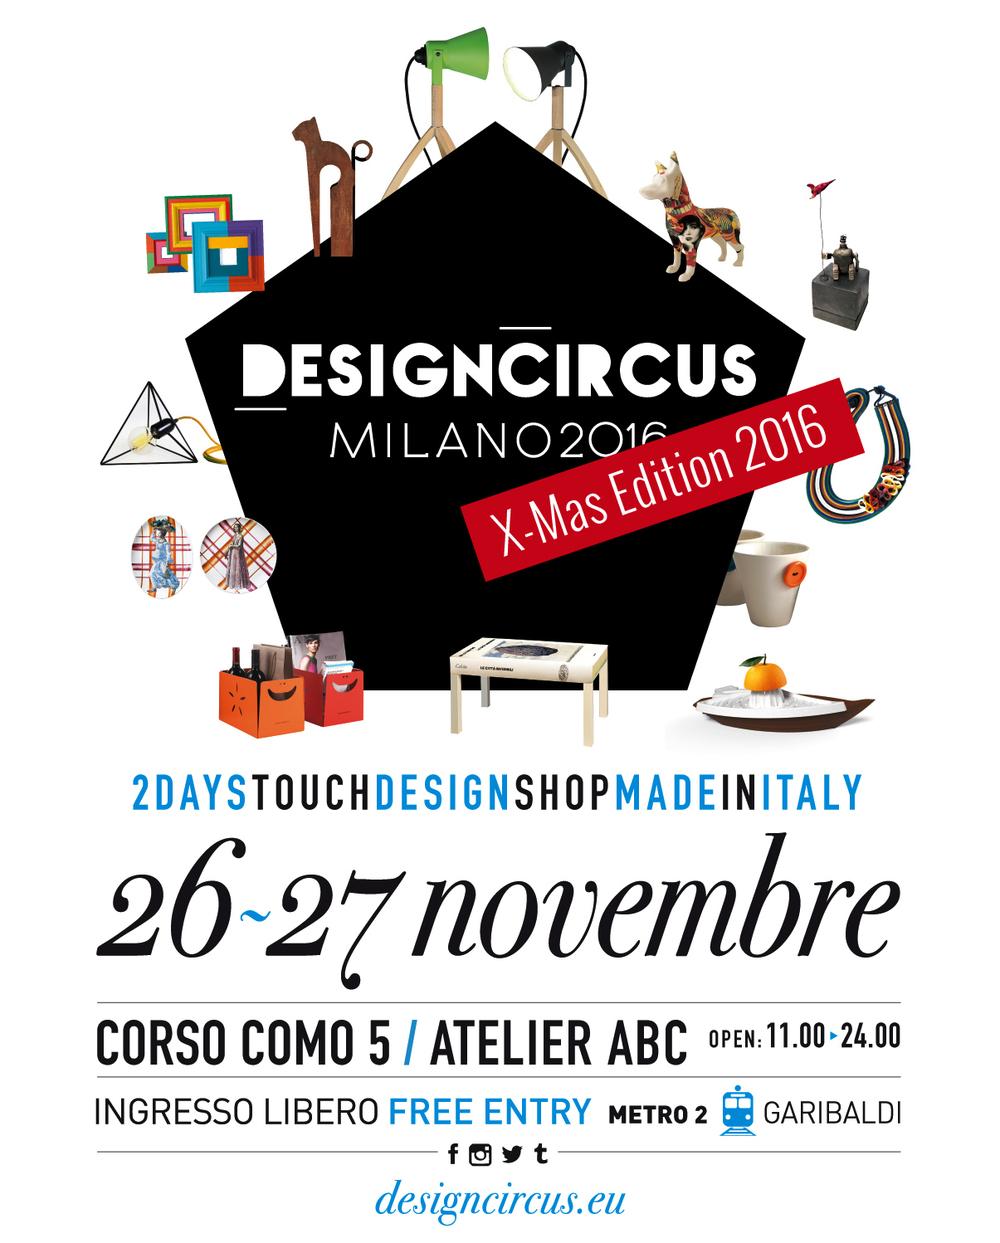 designcircus_xmas2016